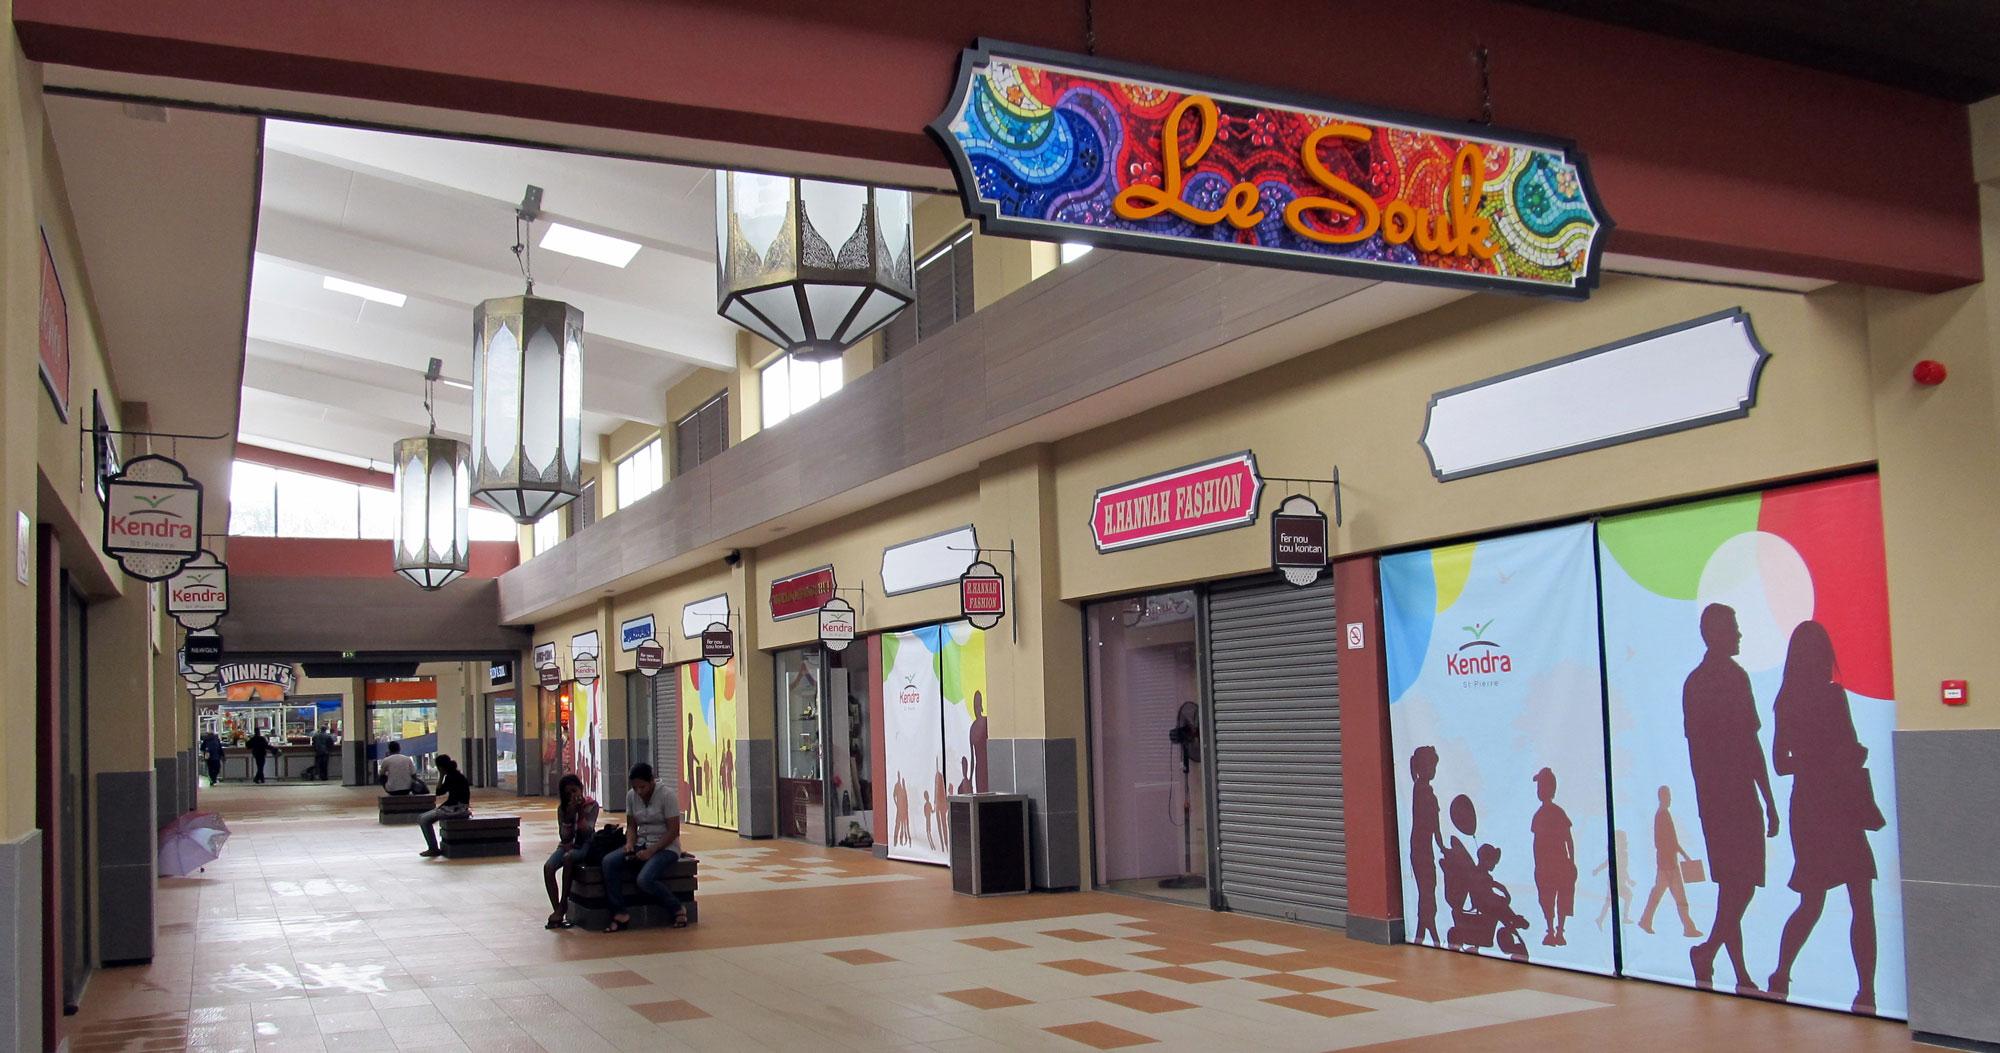 Kendra-Shopping-Centre-2